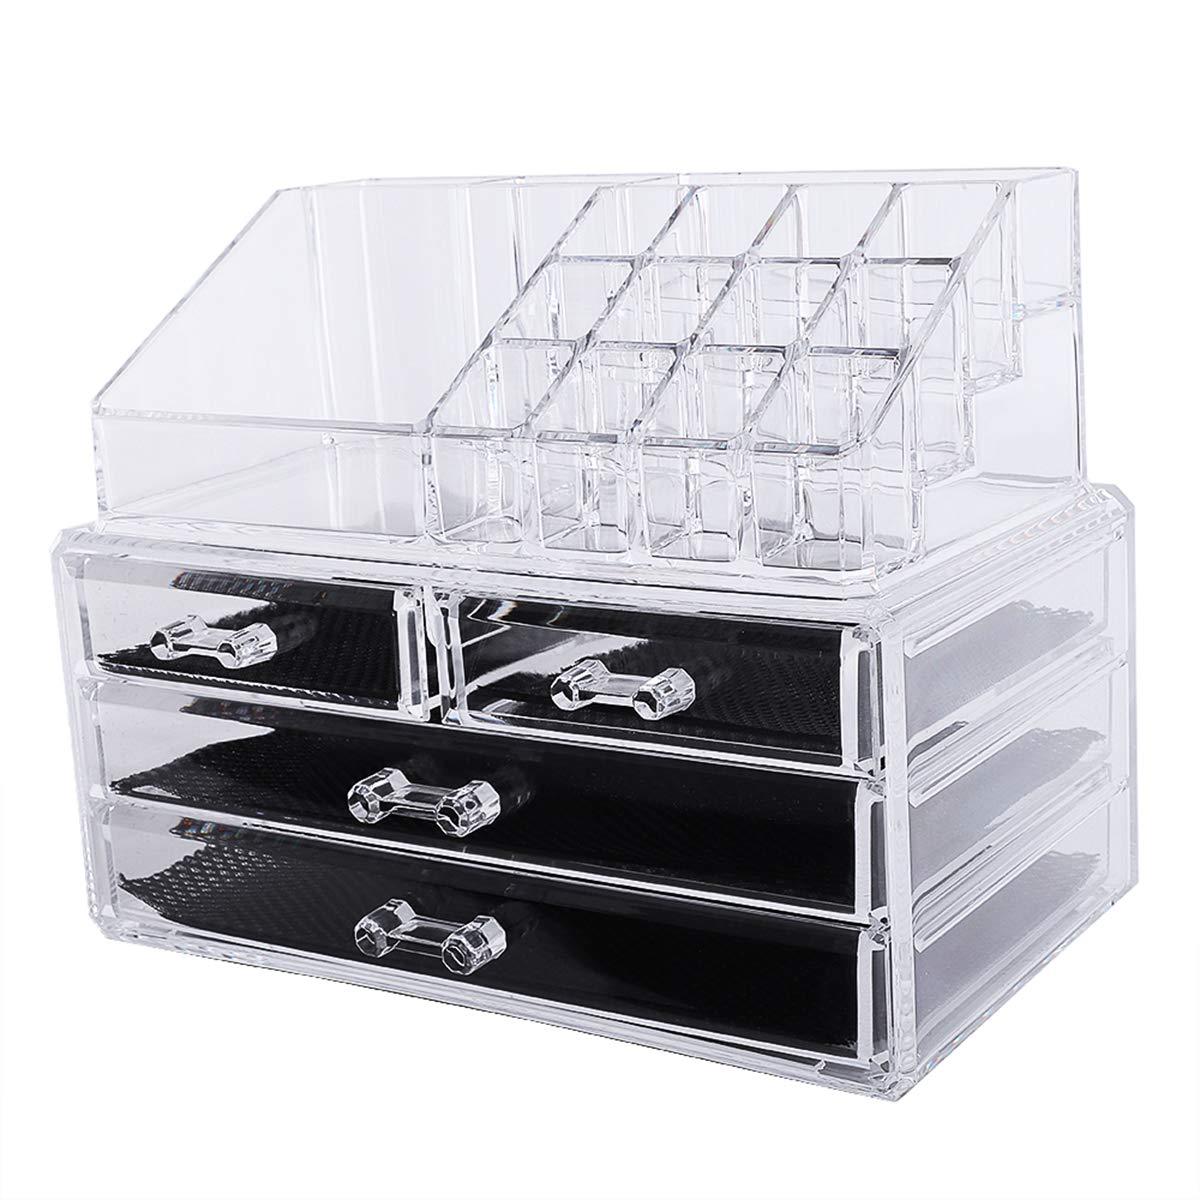 Acrylic Makeup Organizer DIY Large Rack Weekly Sales results No. 1 update Bathroom Holder